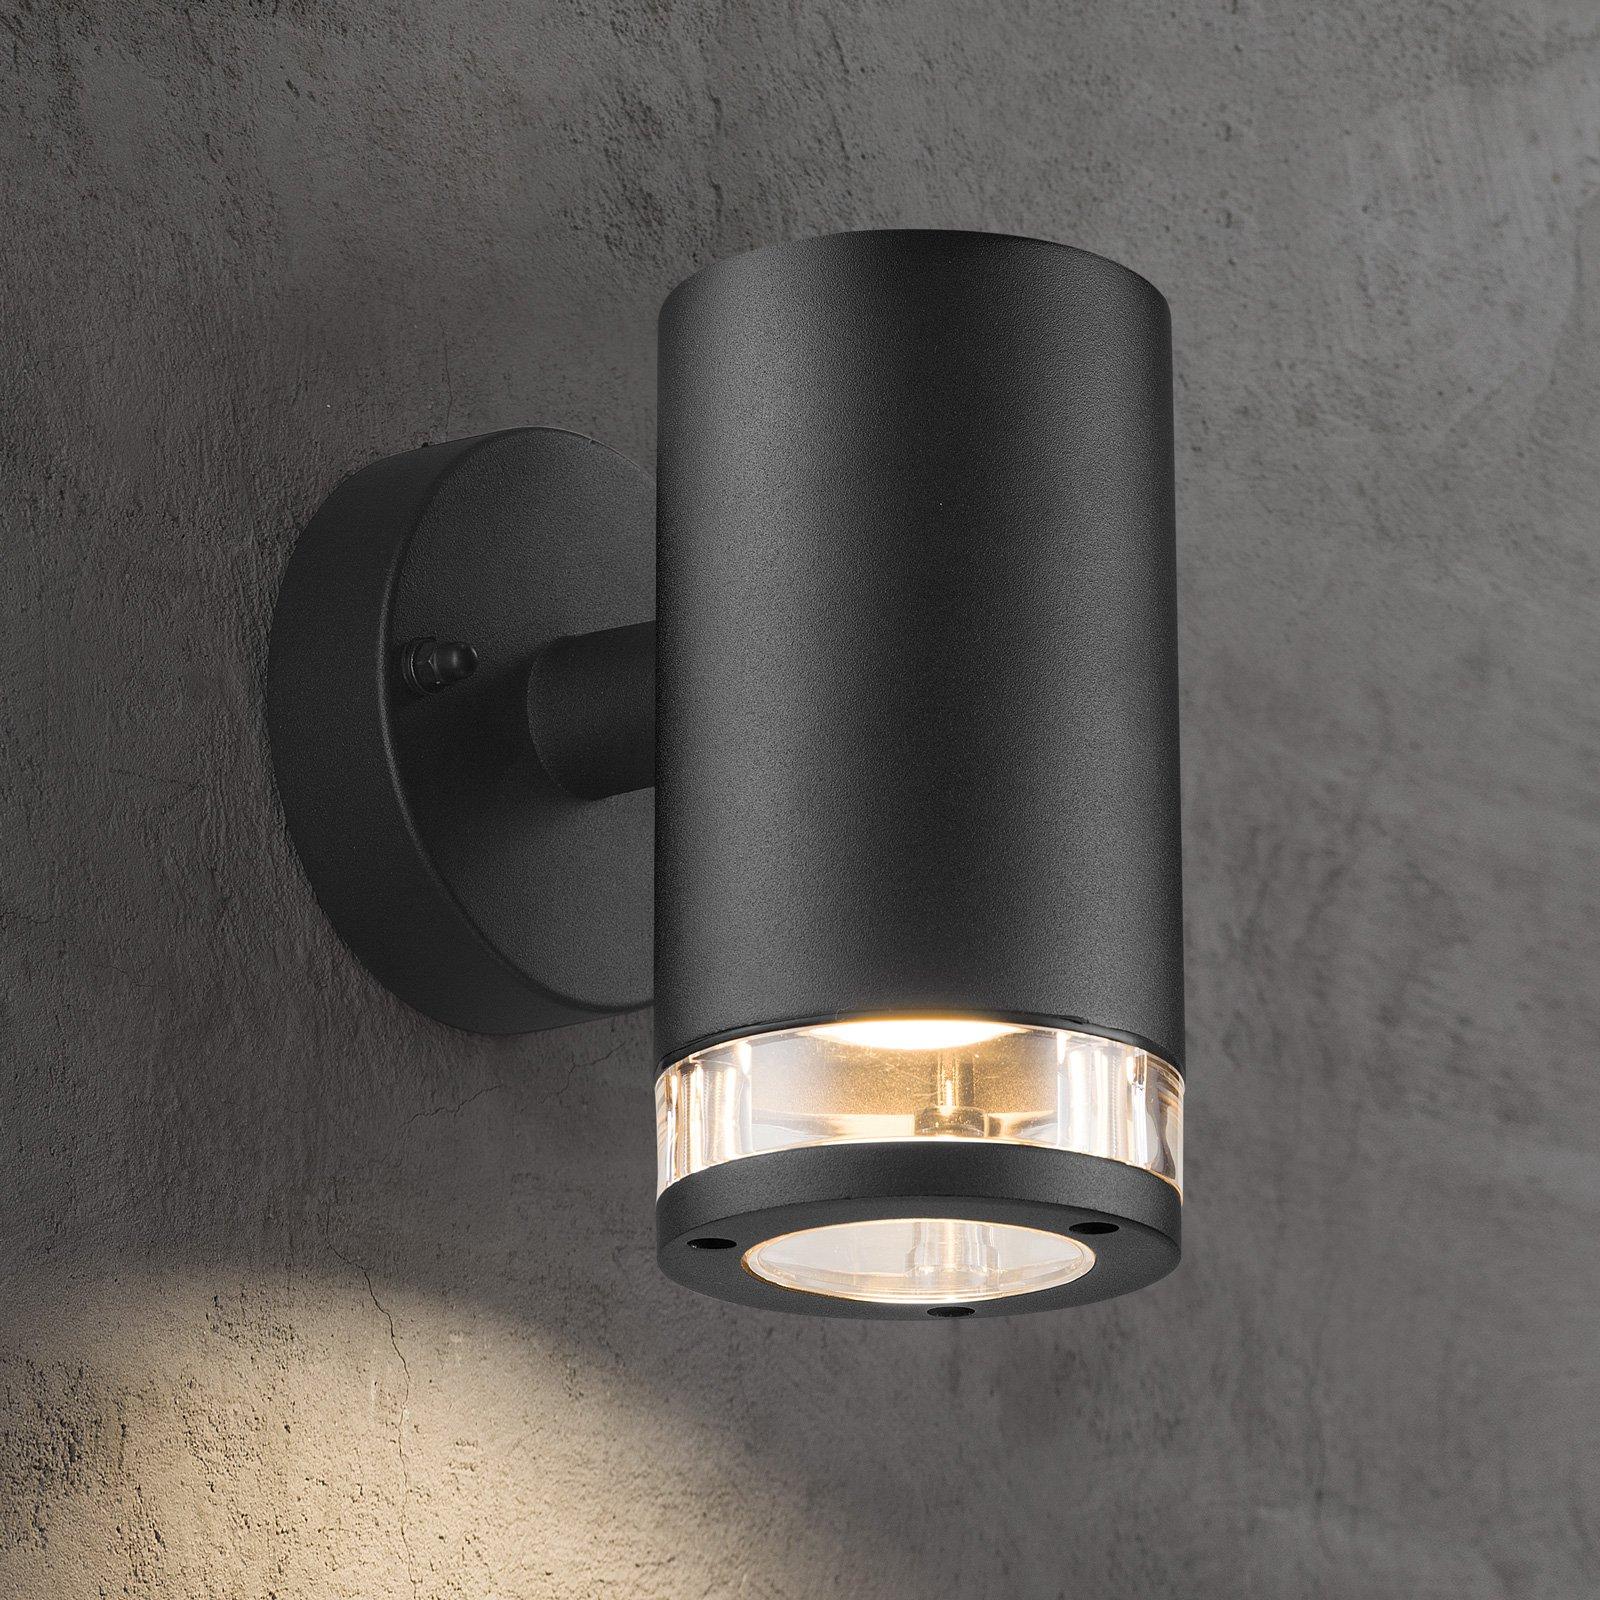 Utendørs vegglampe Birk, 1 lyskilde, svart